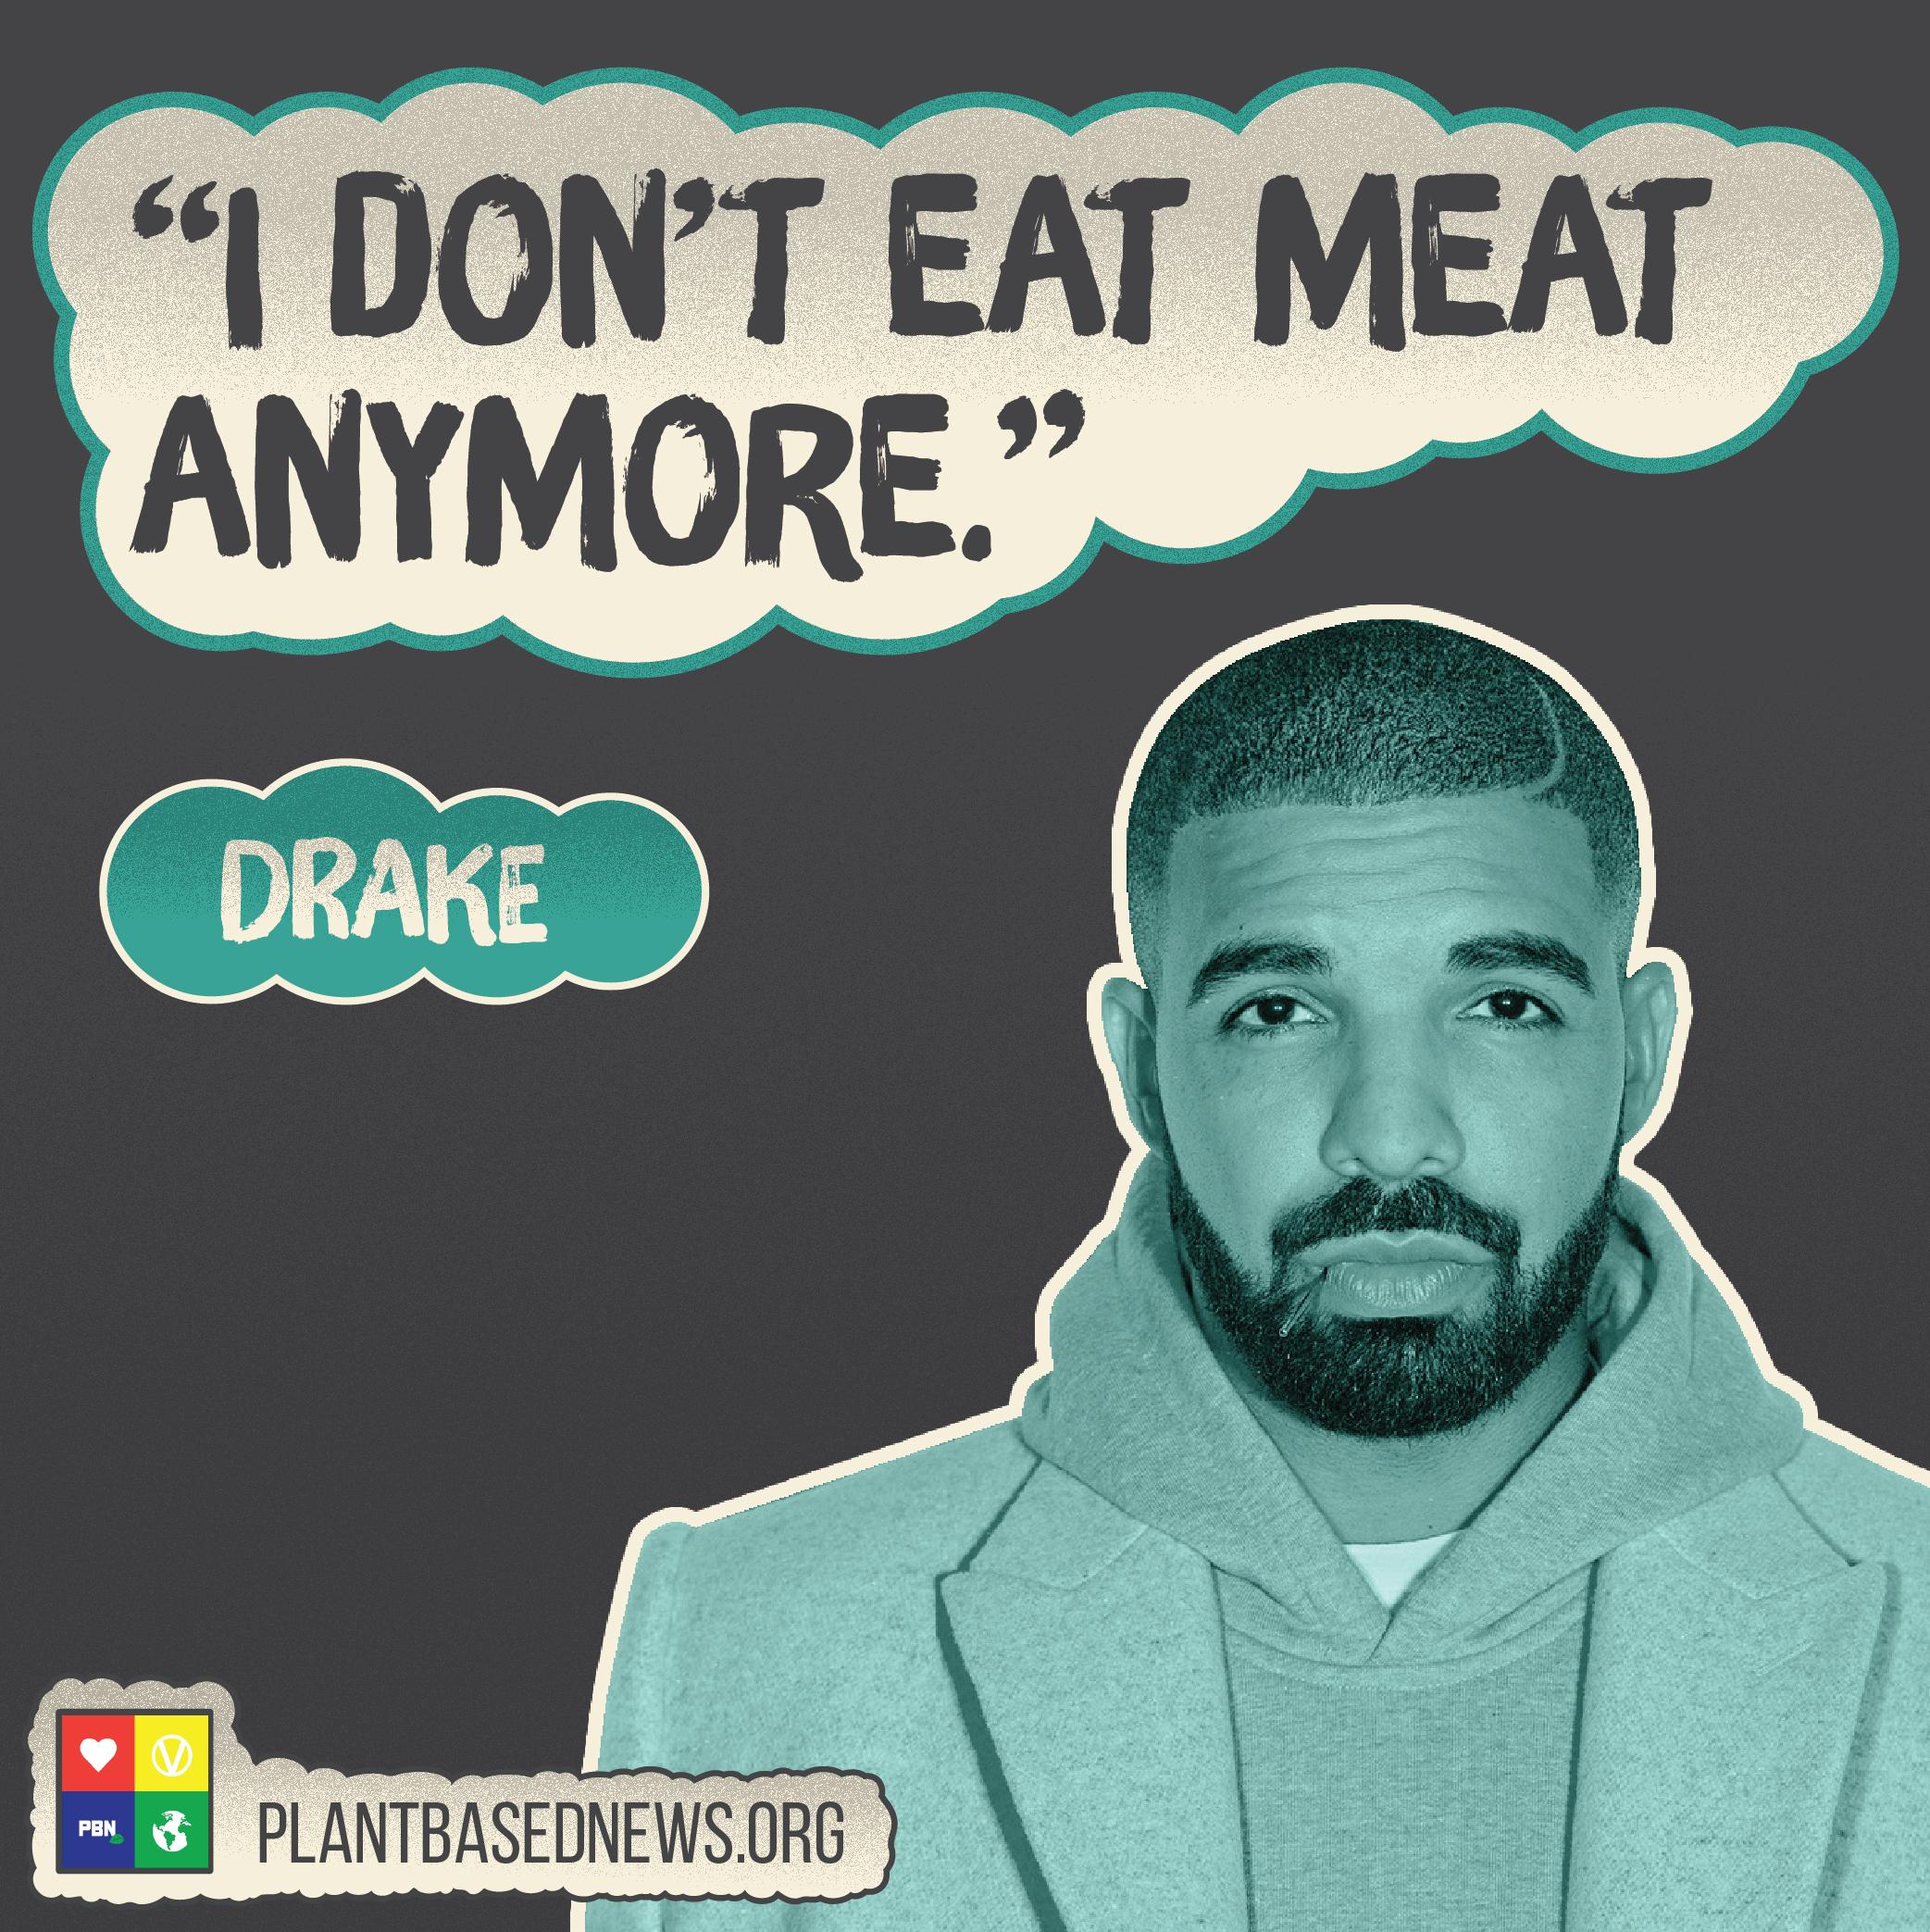 Drake Meme Square.jpg